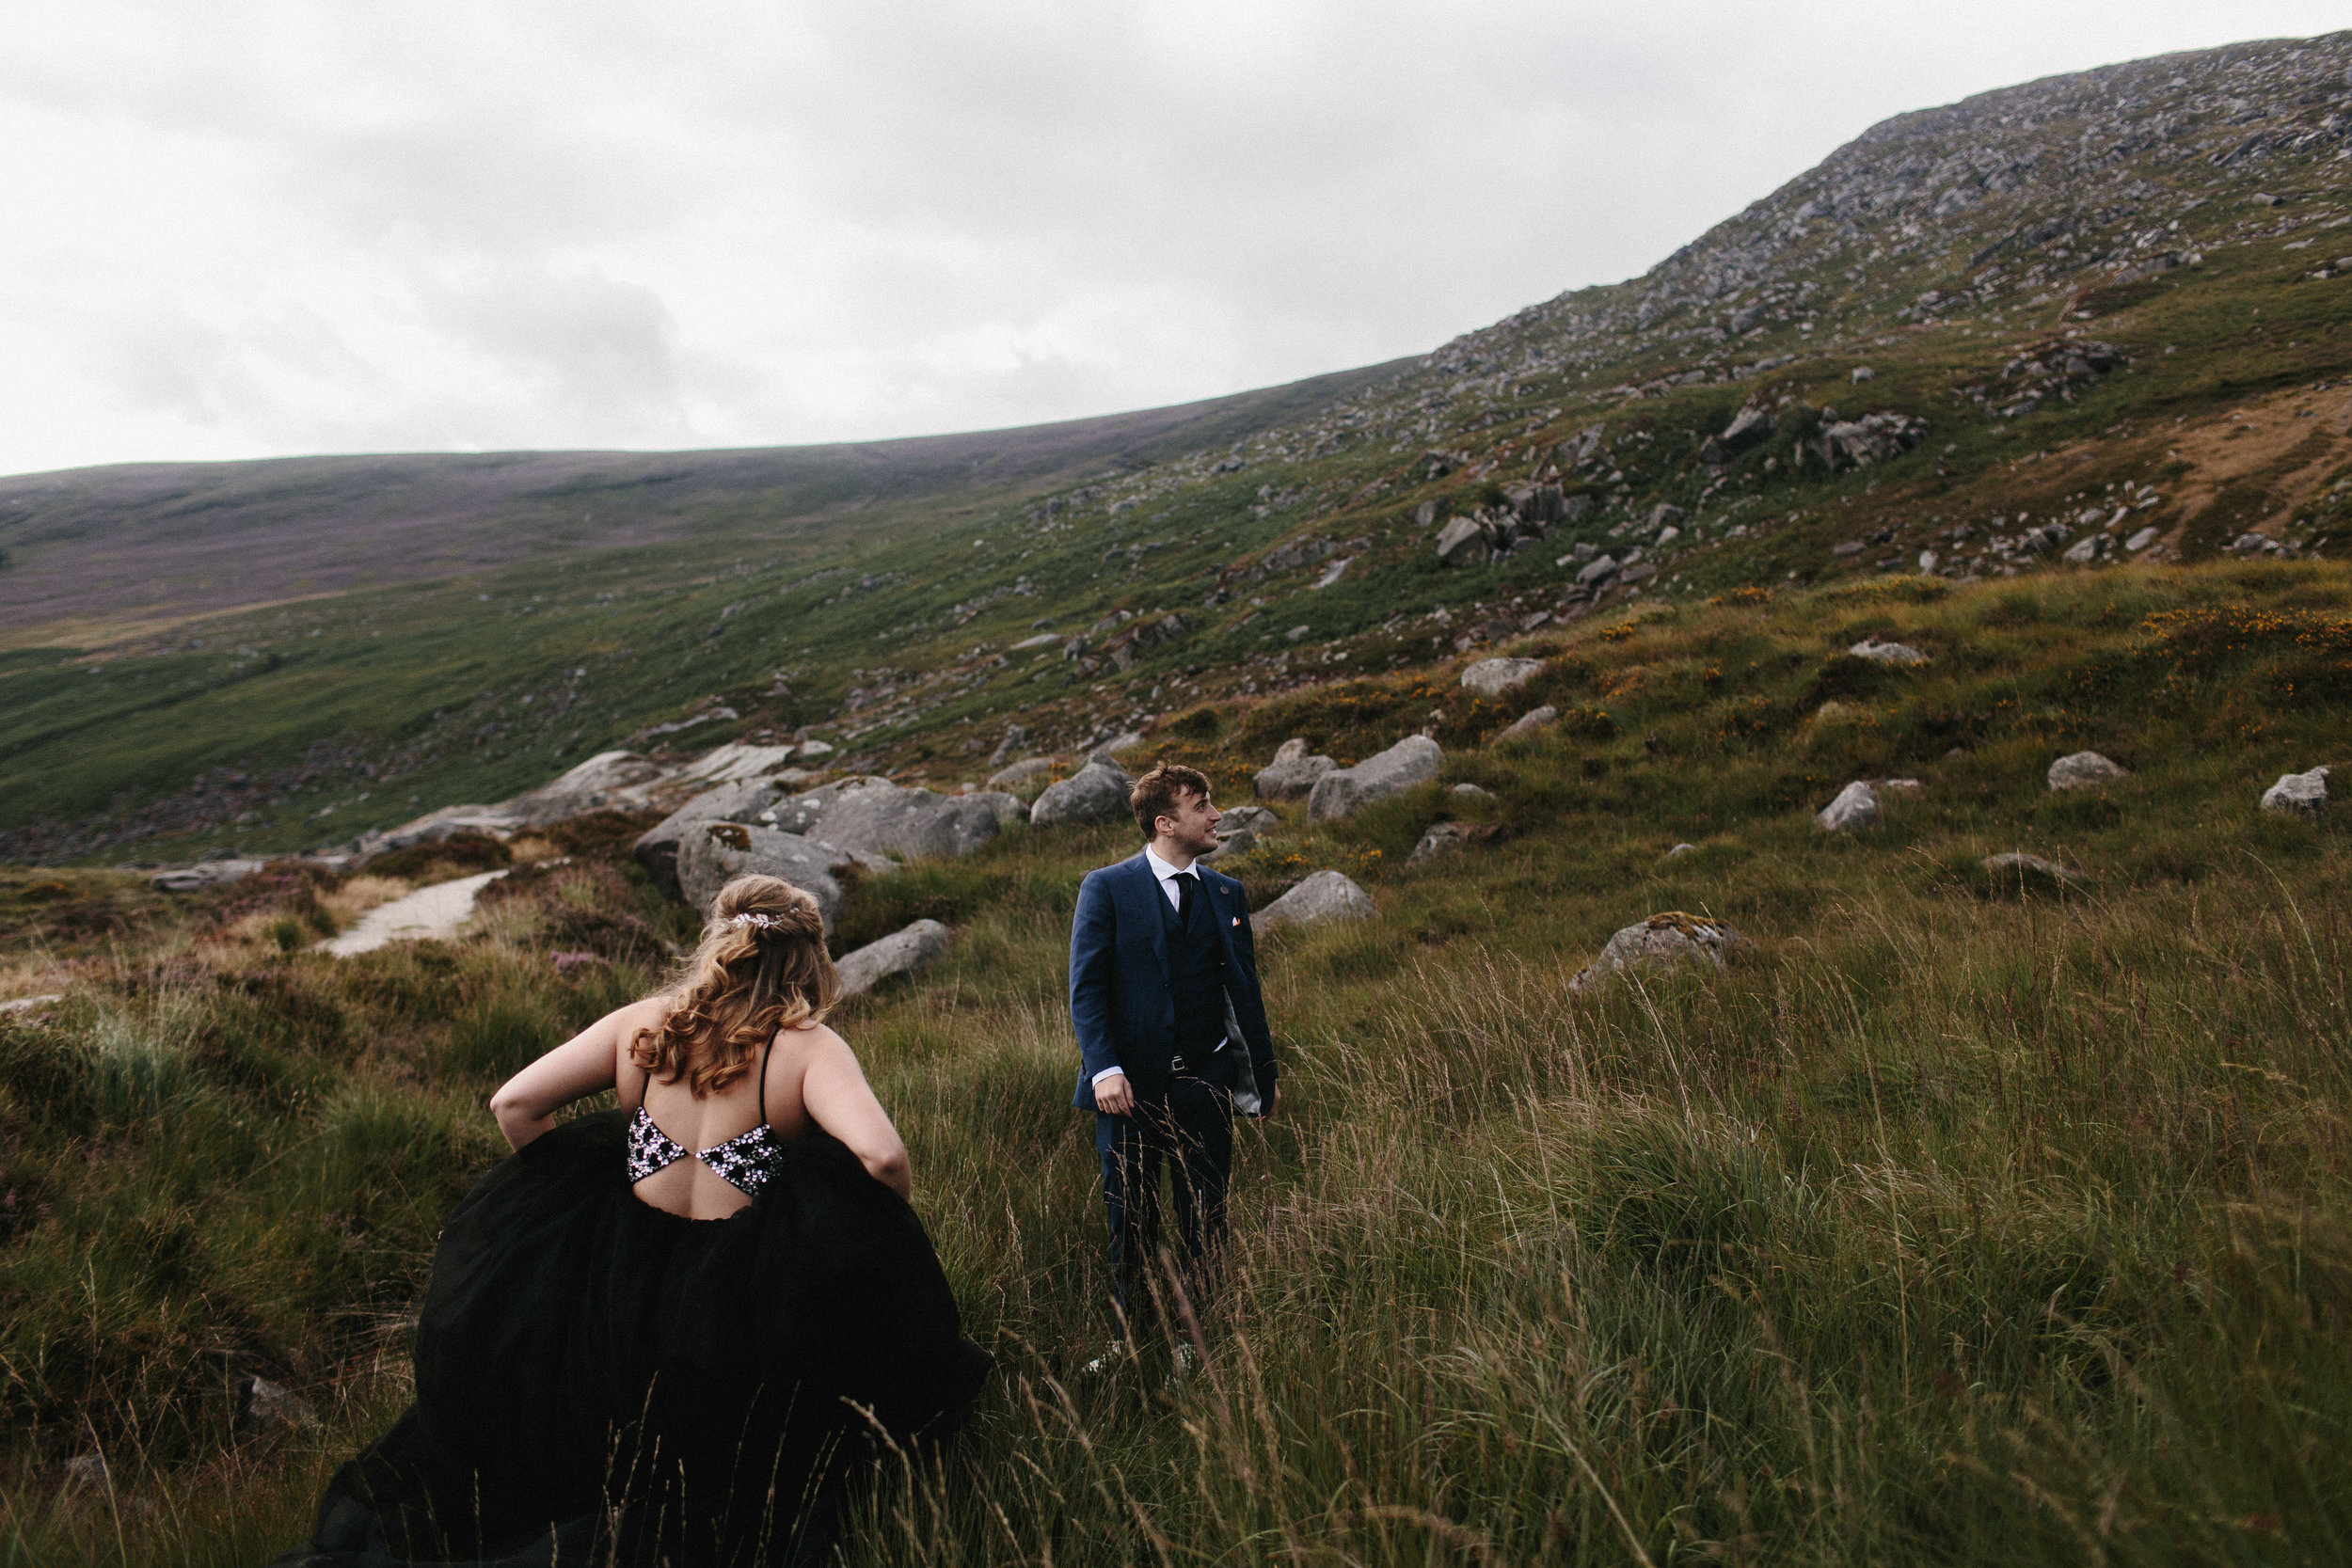 ireland_elopement_black_wedding_dress_wicklow_glendalough_athy_st_kevins_way_1154.jpg